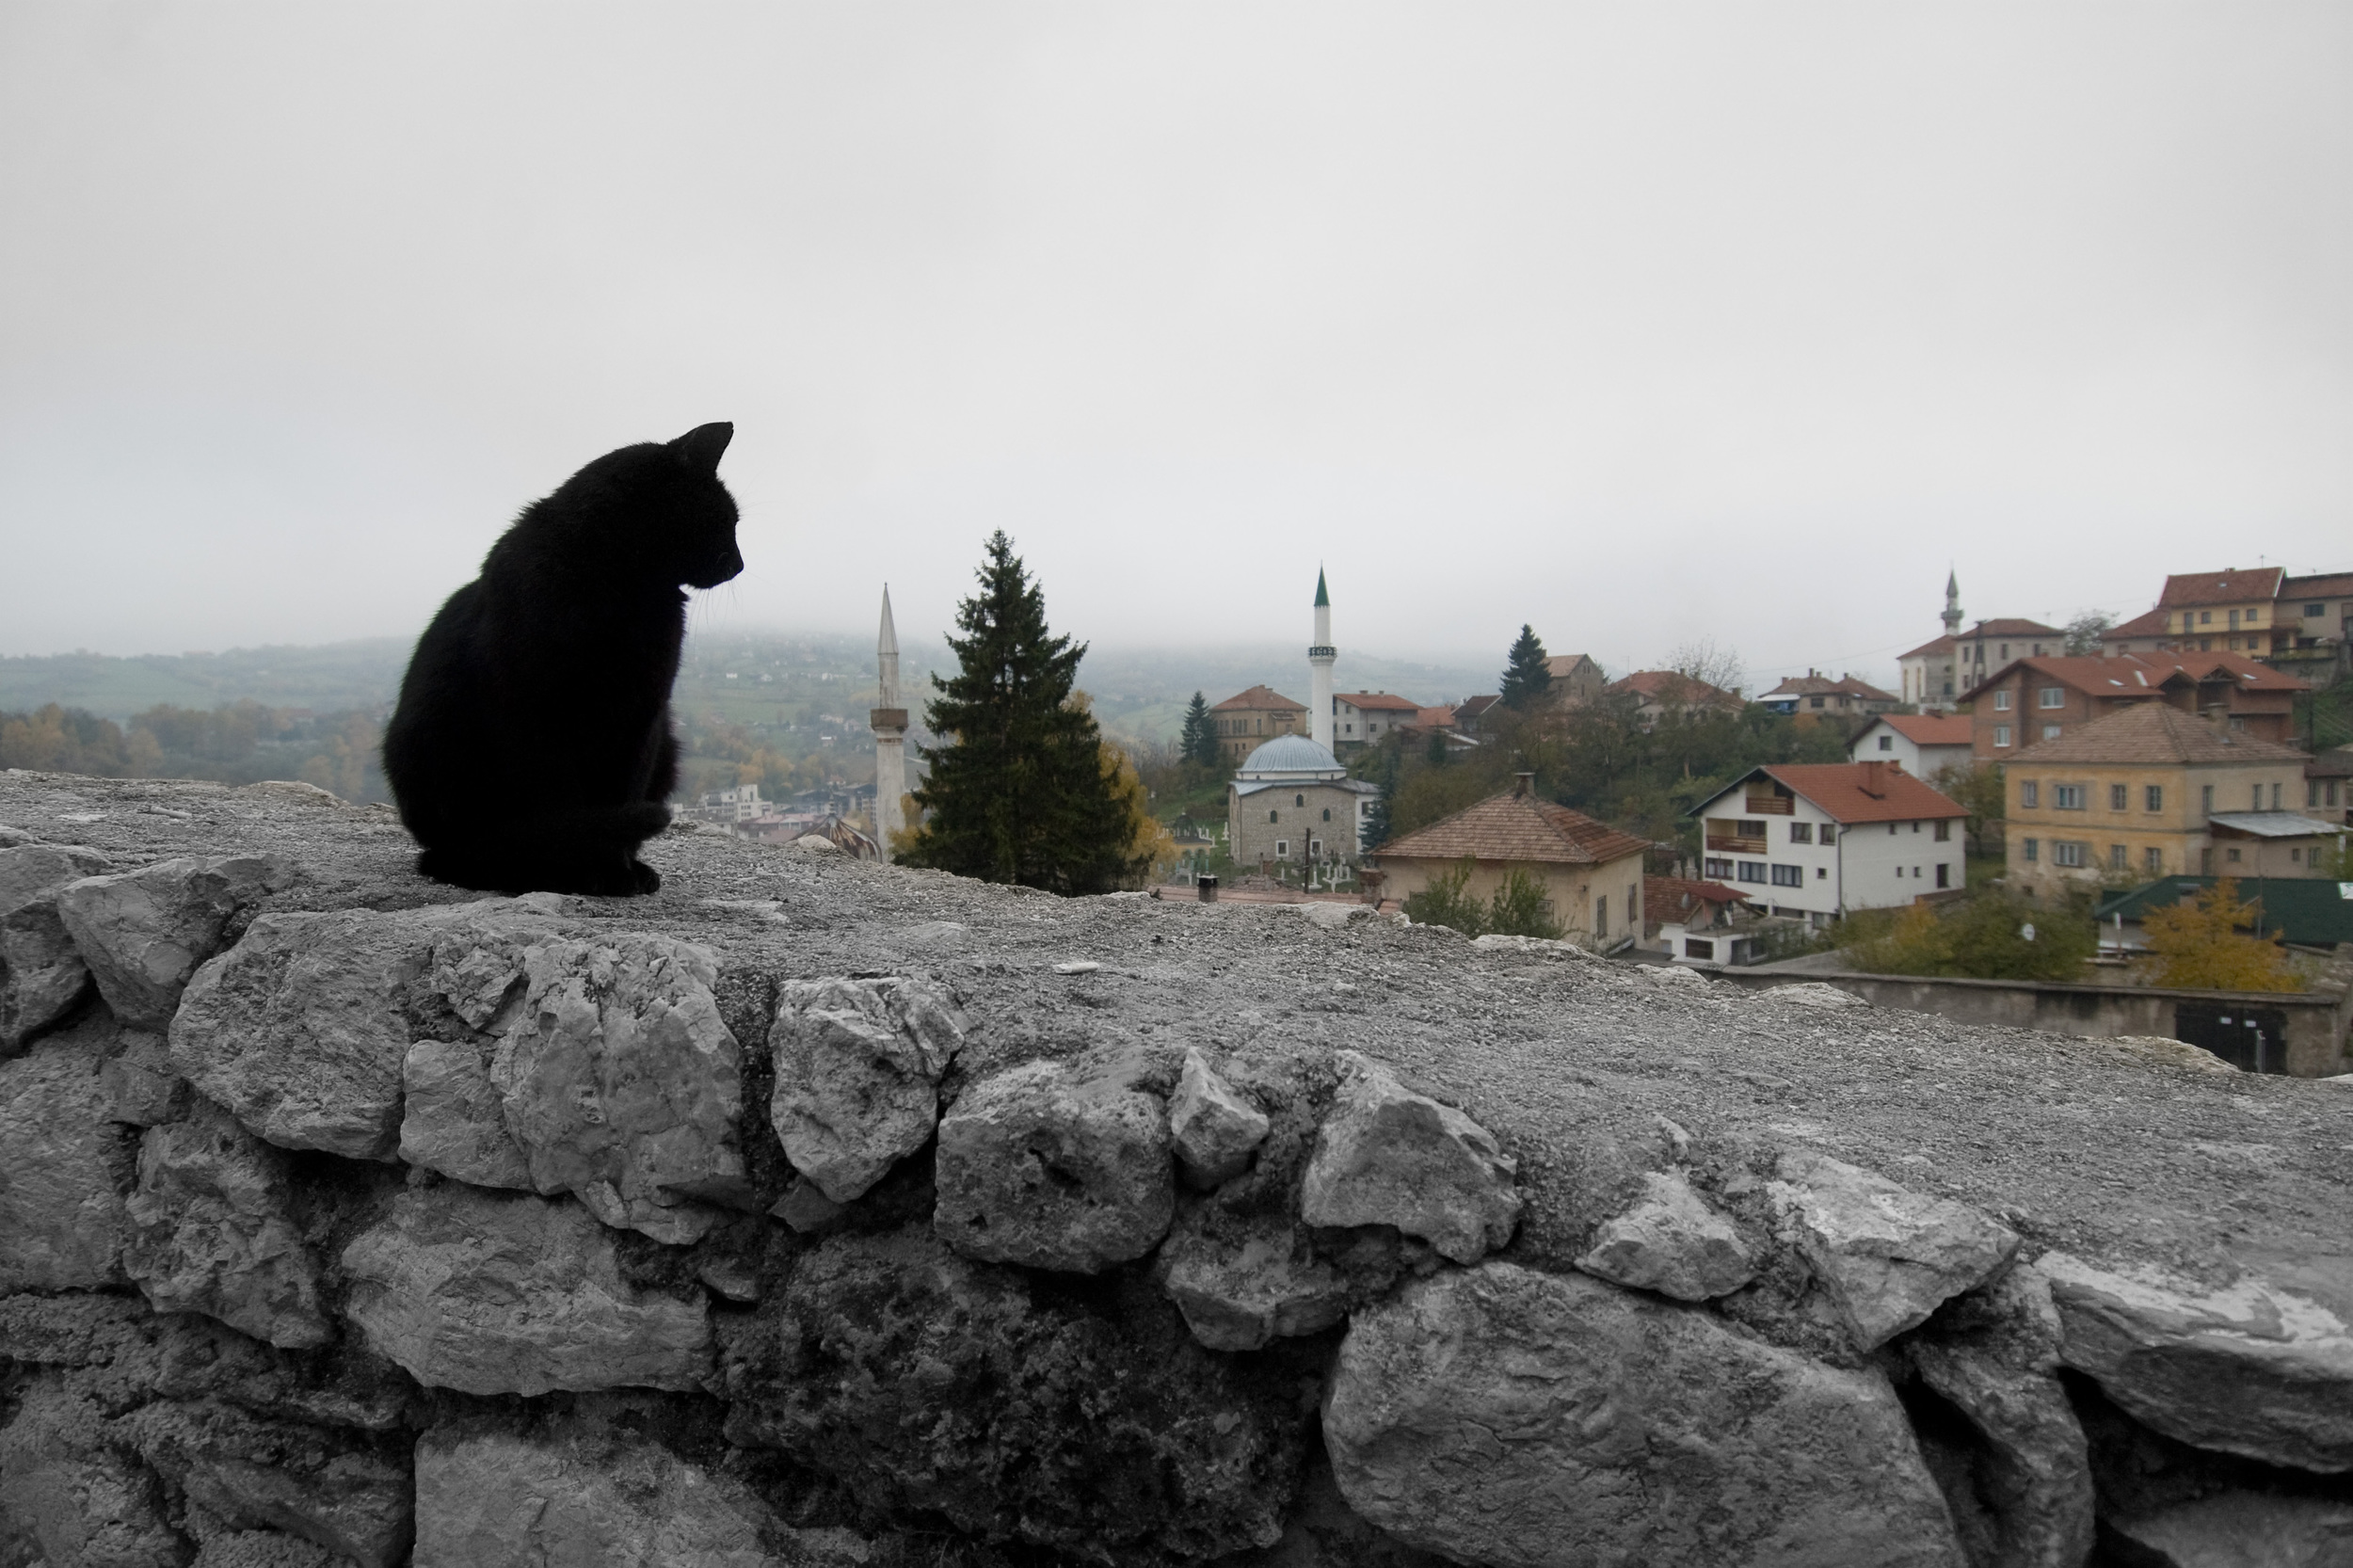 e2f_2042676_Travnik copy.jpg